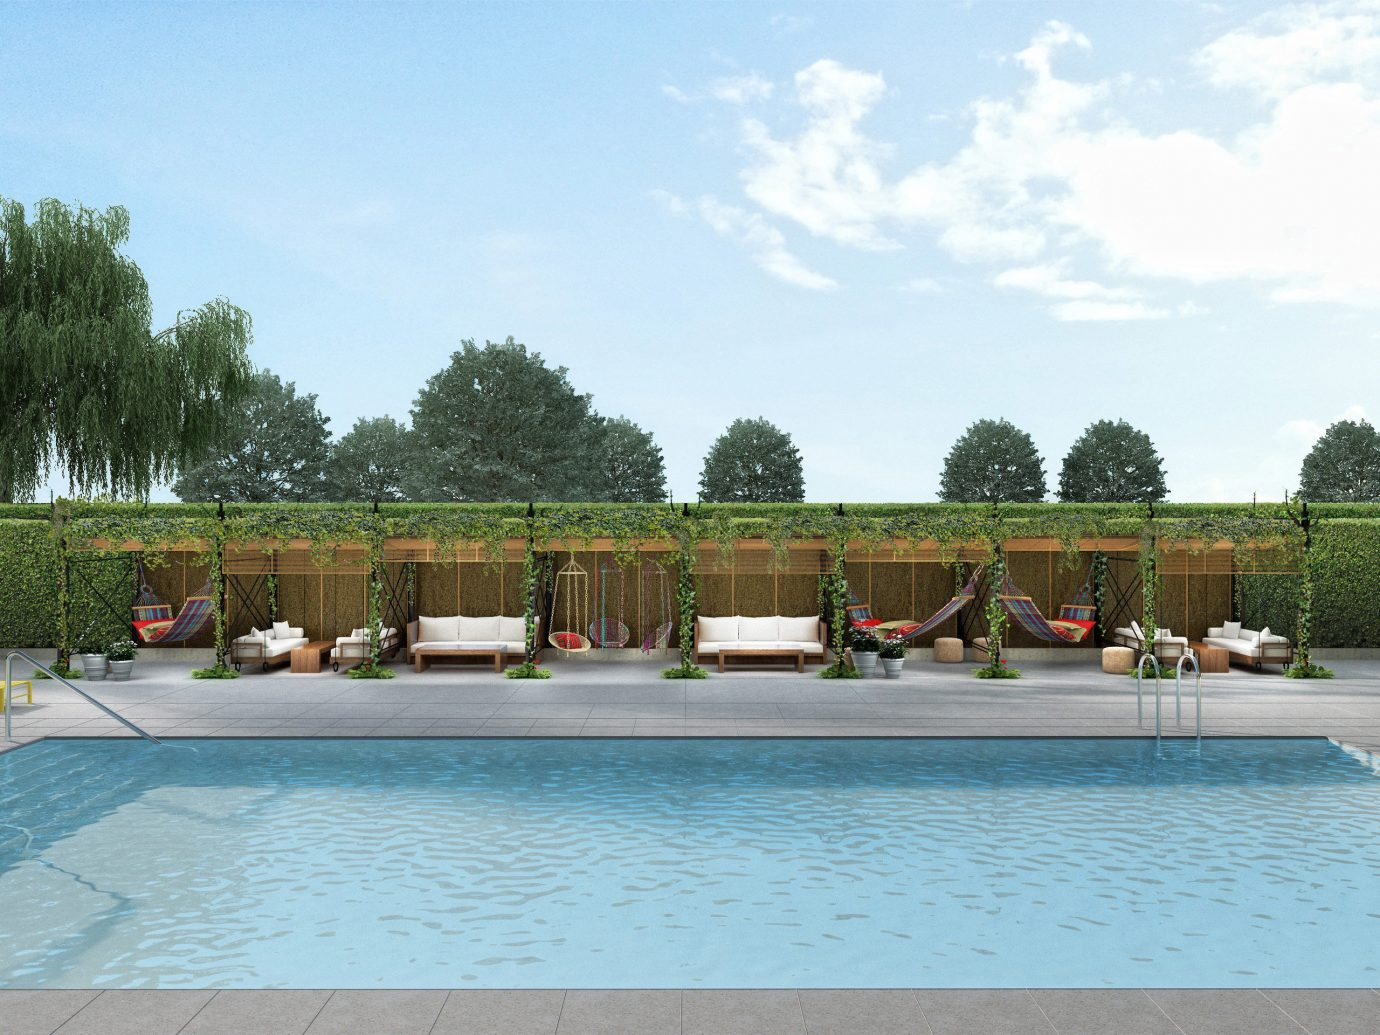 Hotels Solo Travel sky tree outdoor swimming pool leisure property estate reflecting pool Resort backyard Villa real estate Pool swimming